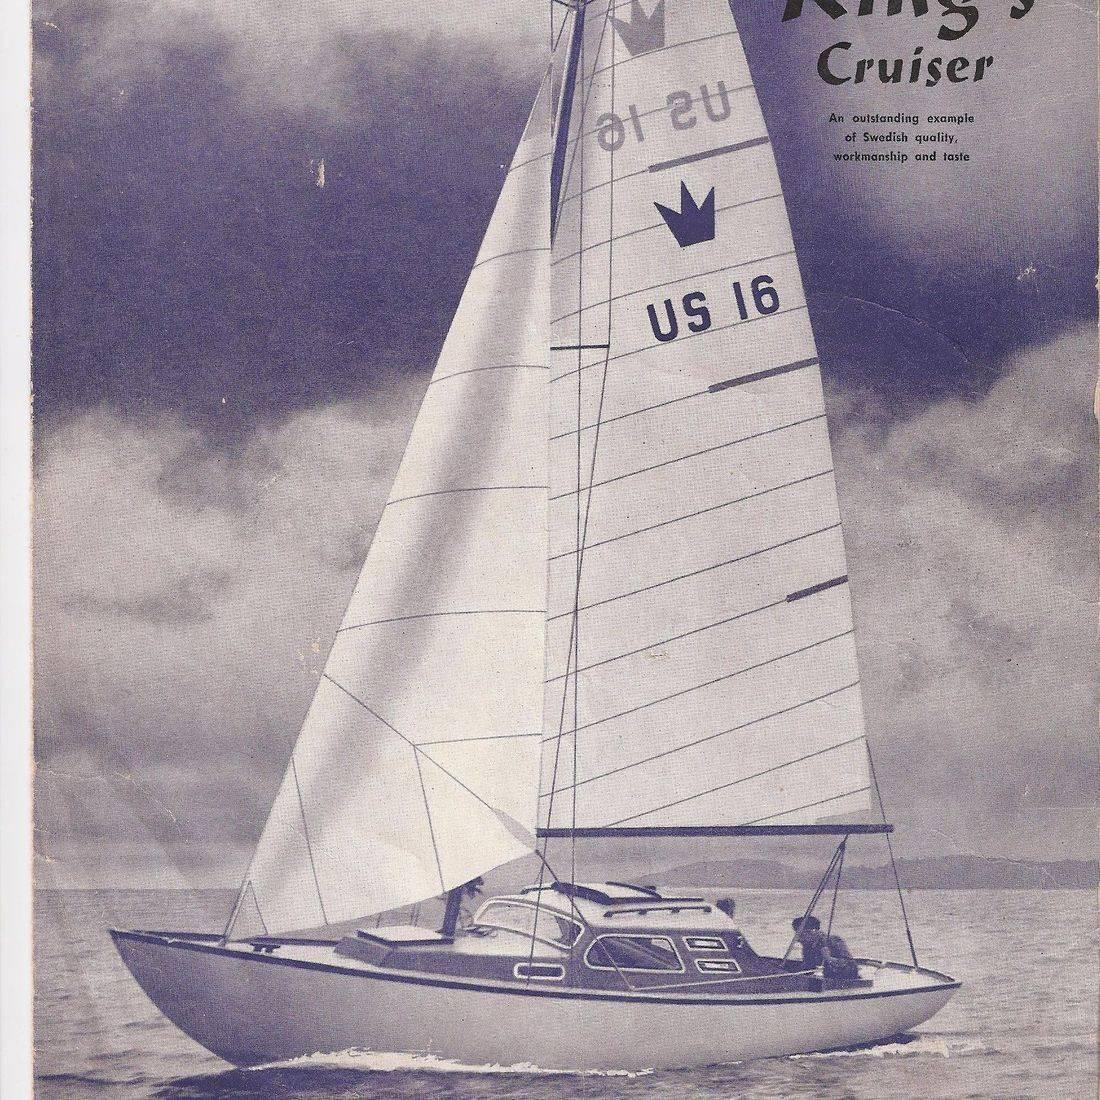 King's Cruiser Wooden Sailboat